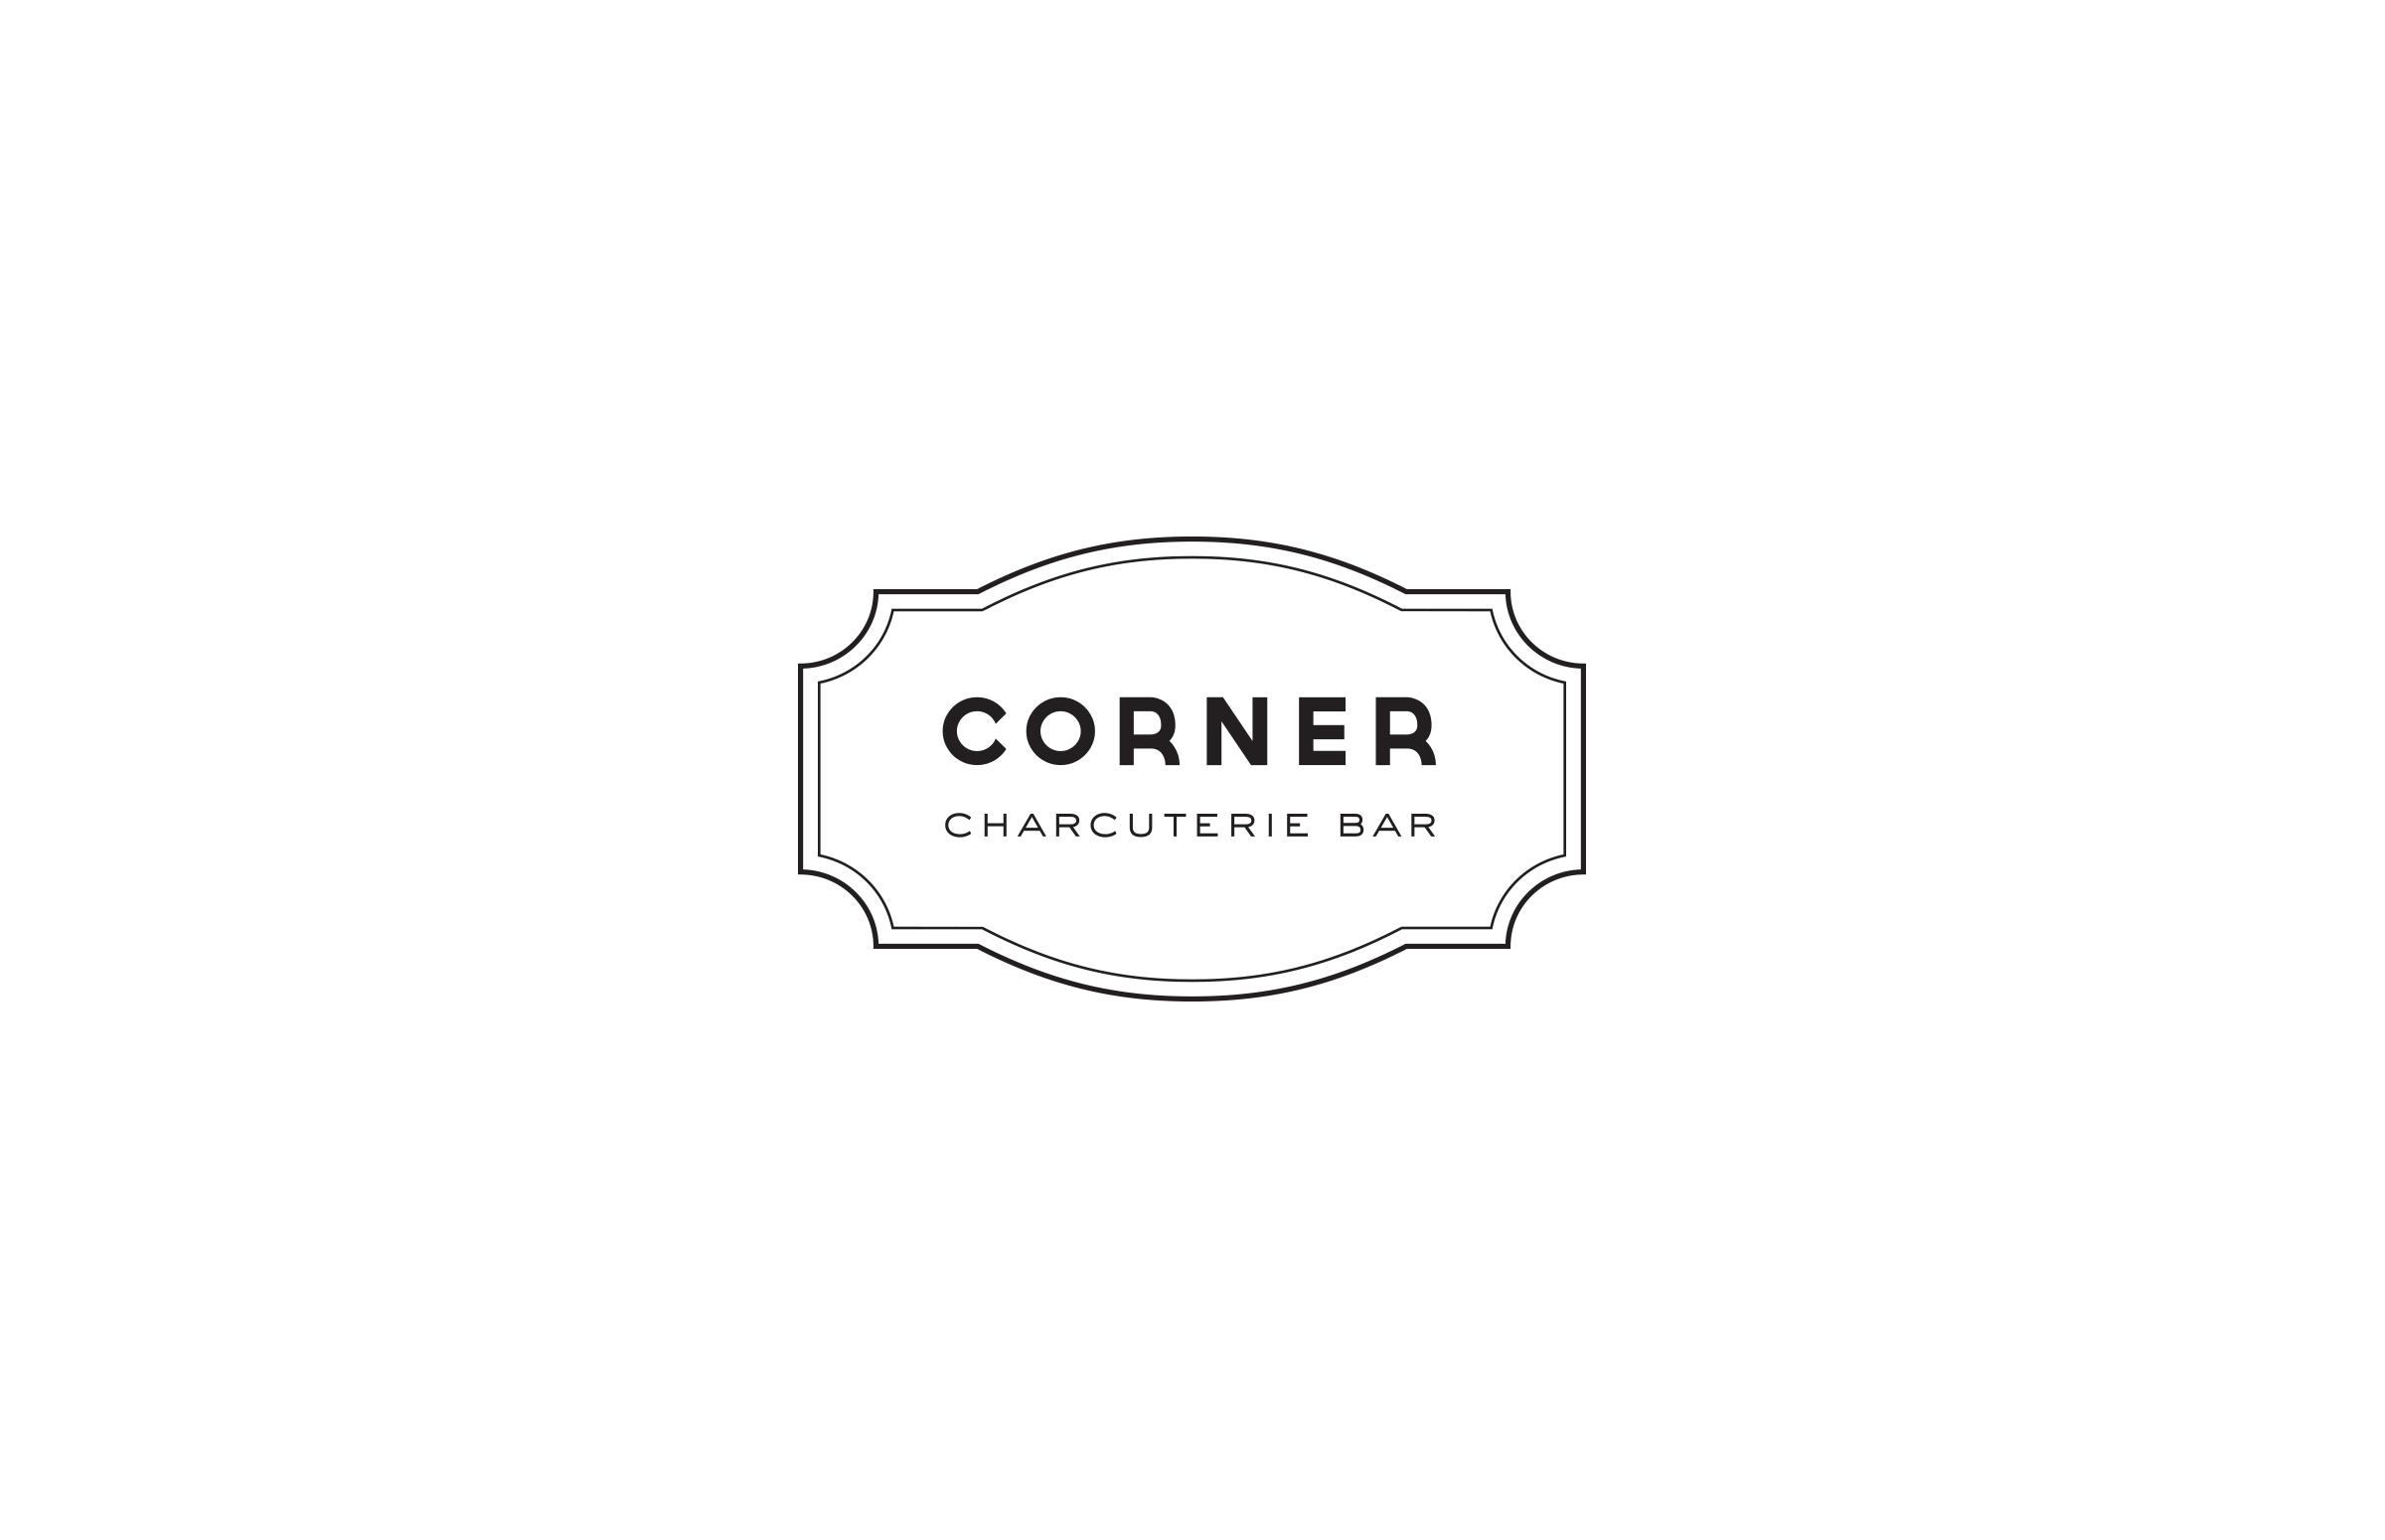 Corner Charcuterie Bar: Logo Design